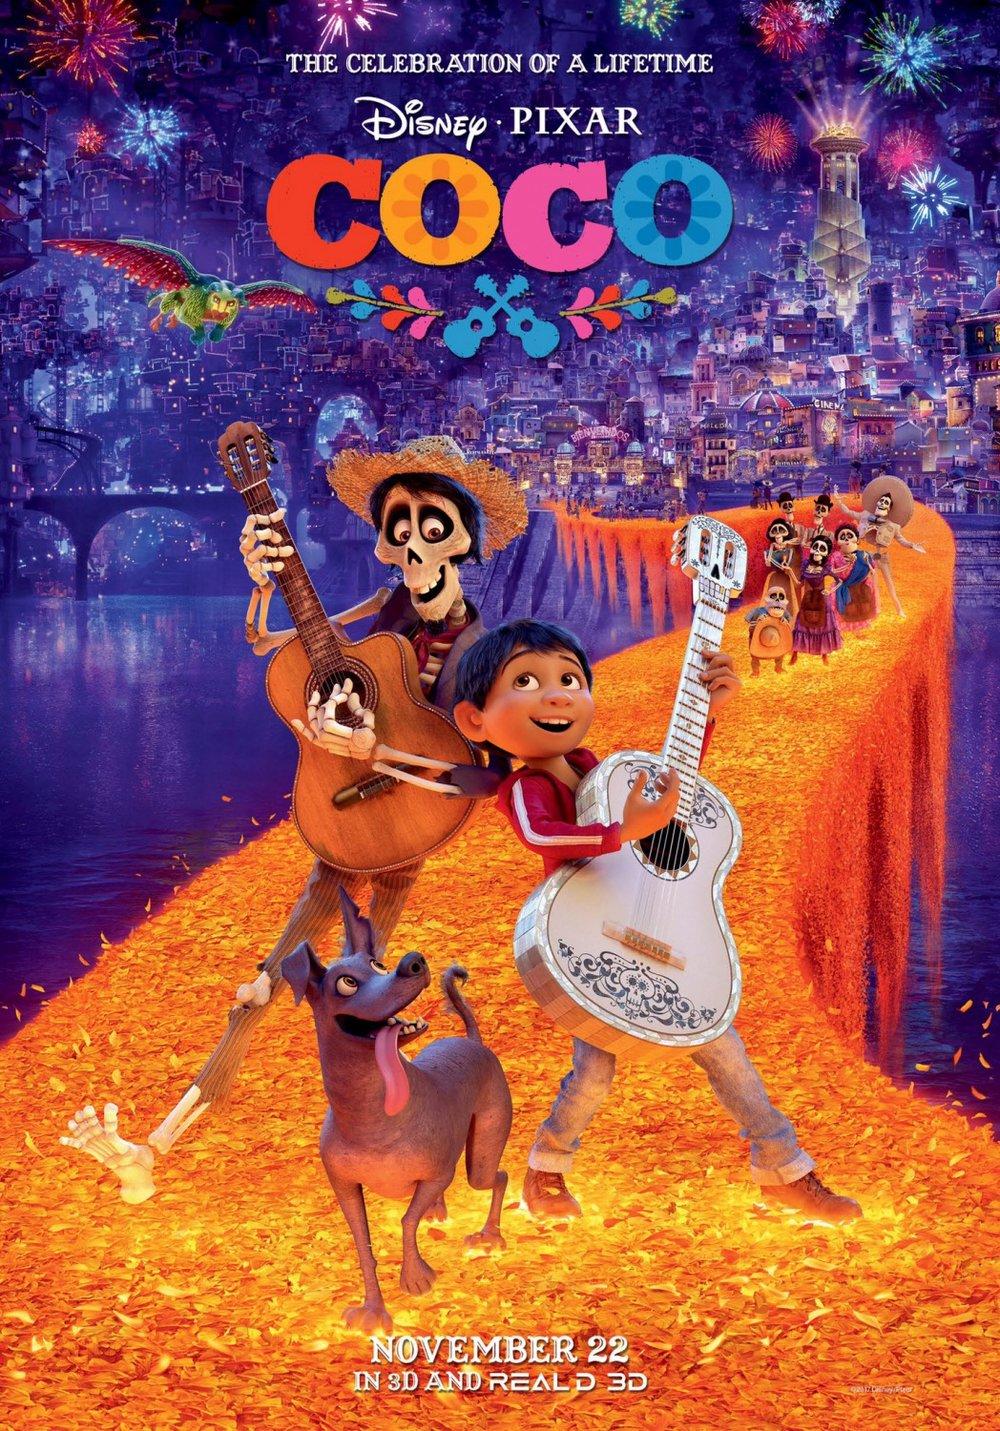 Coco Movie Poster.jpg